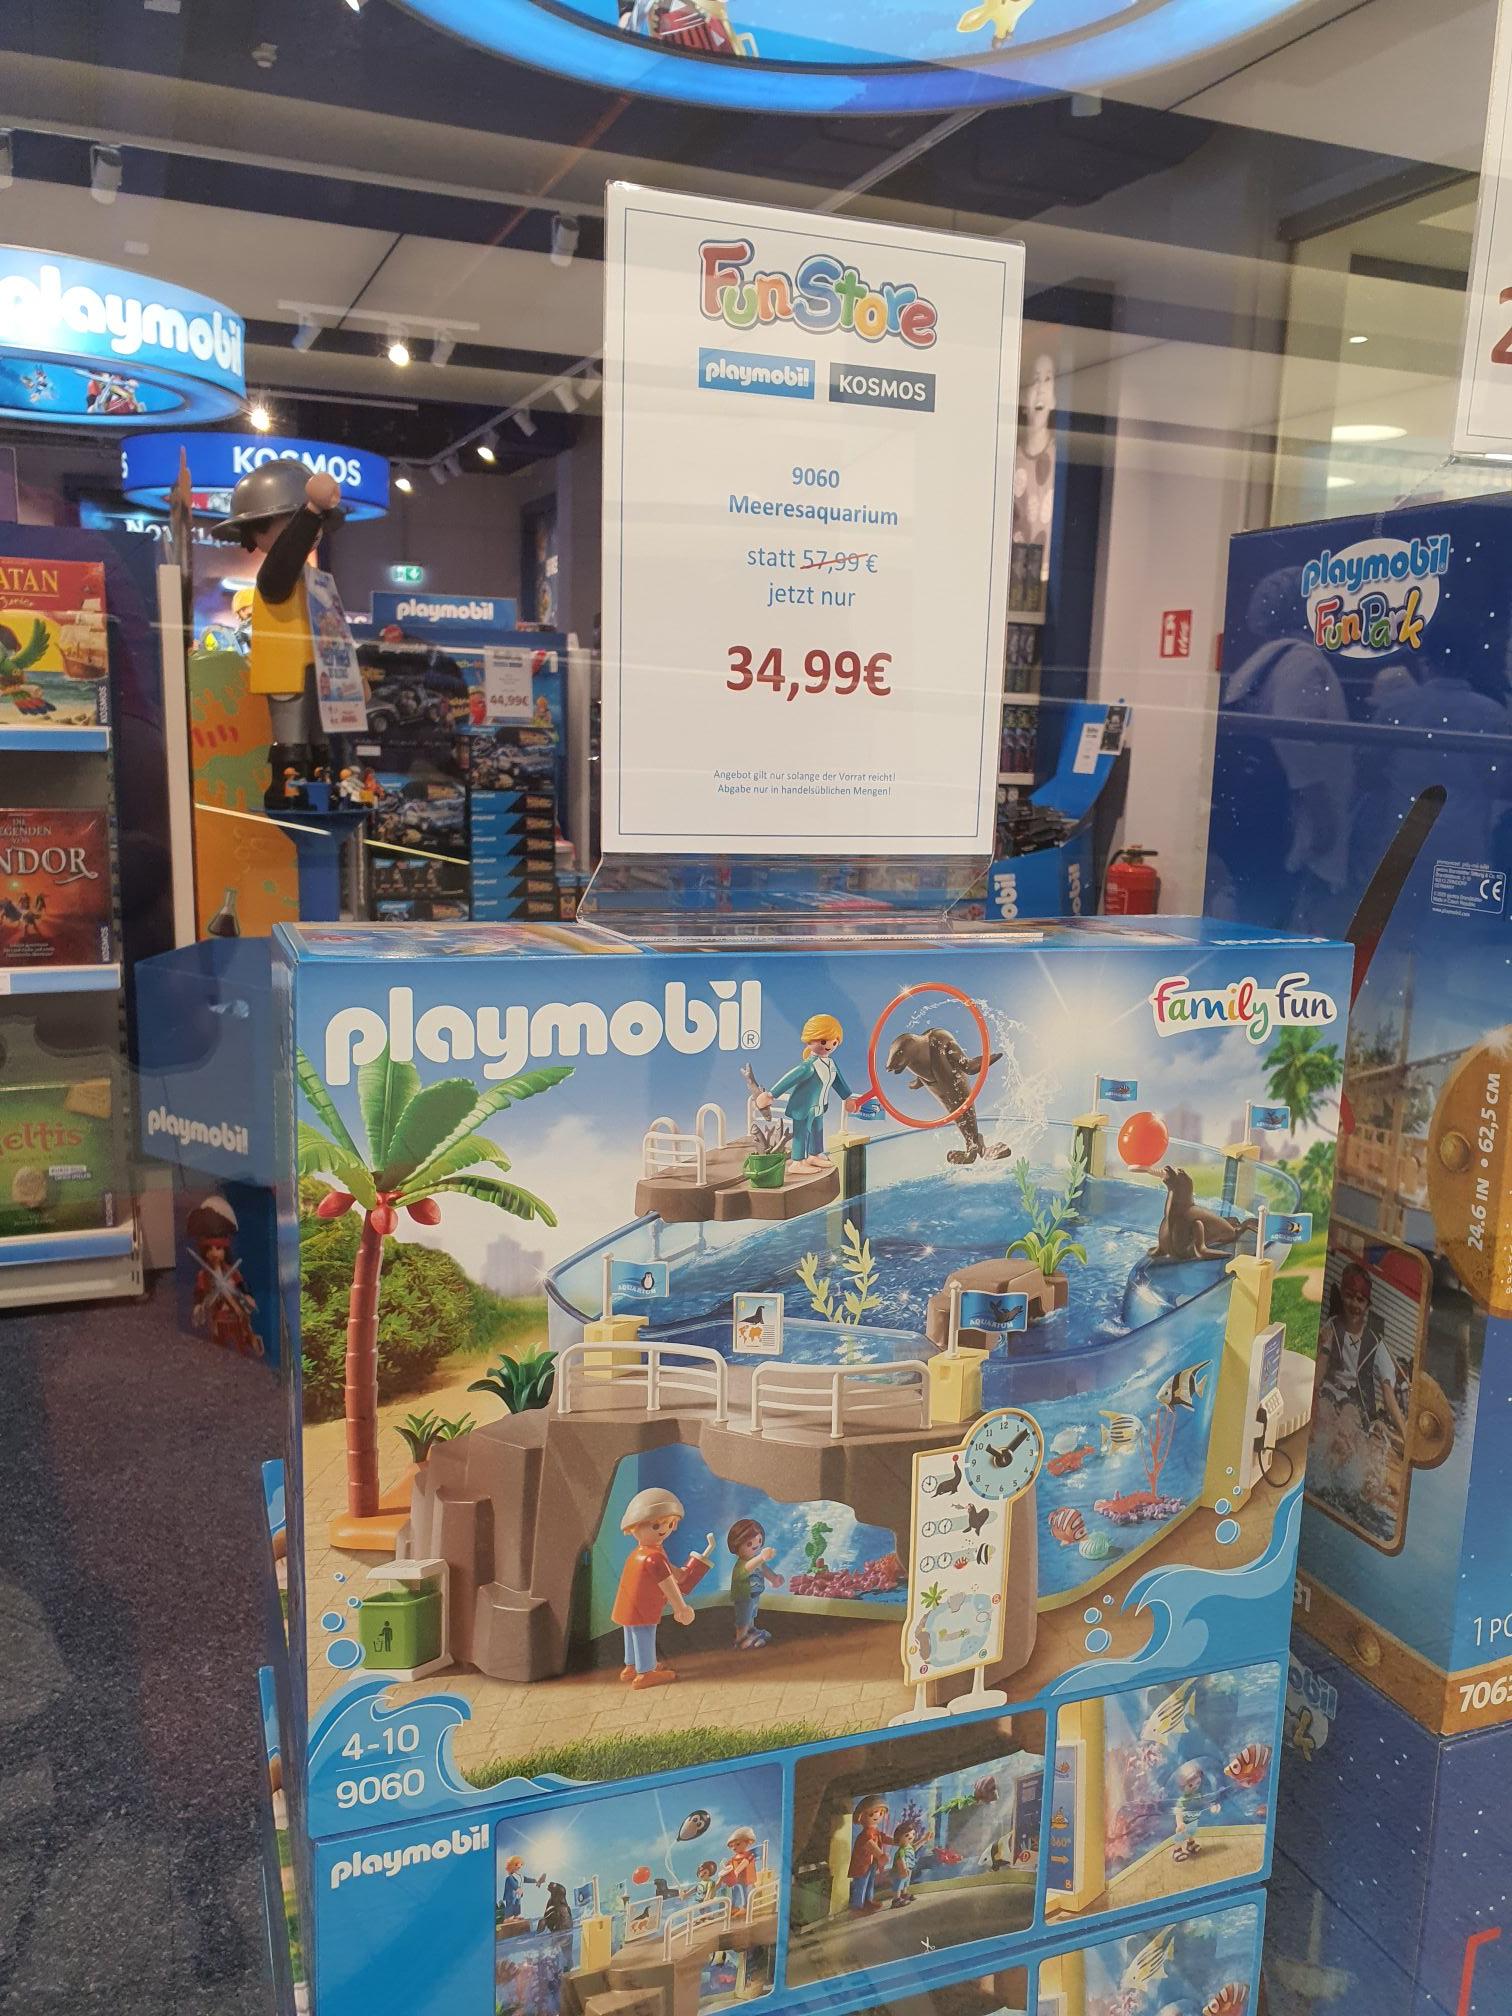 [Lokal FFM im NWZ] Playmobil 9060 Meeresaquarium